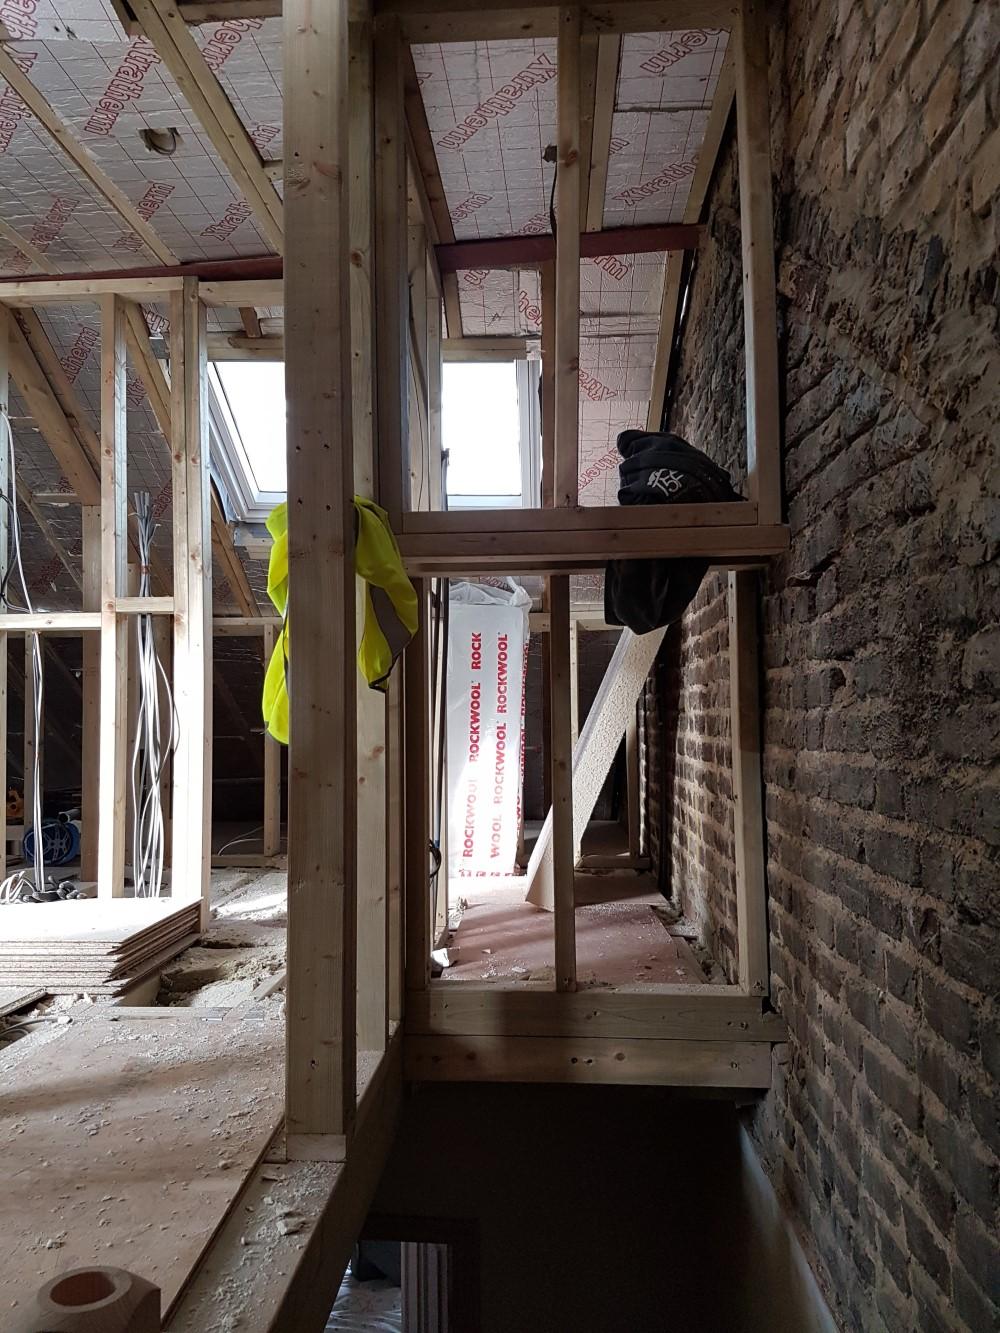 rjv-home-design-refurbishment-london-61141d379852c